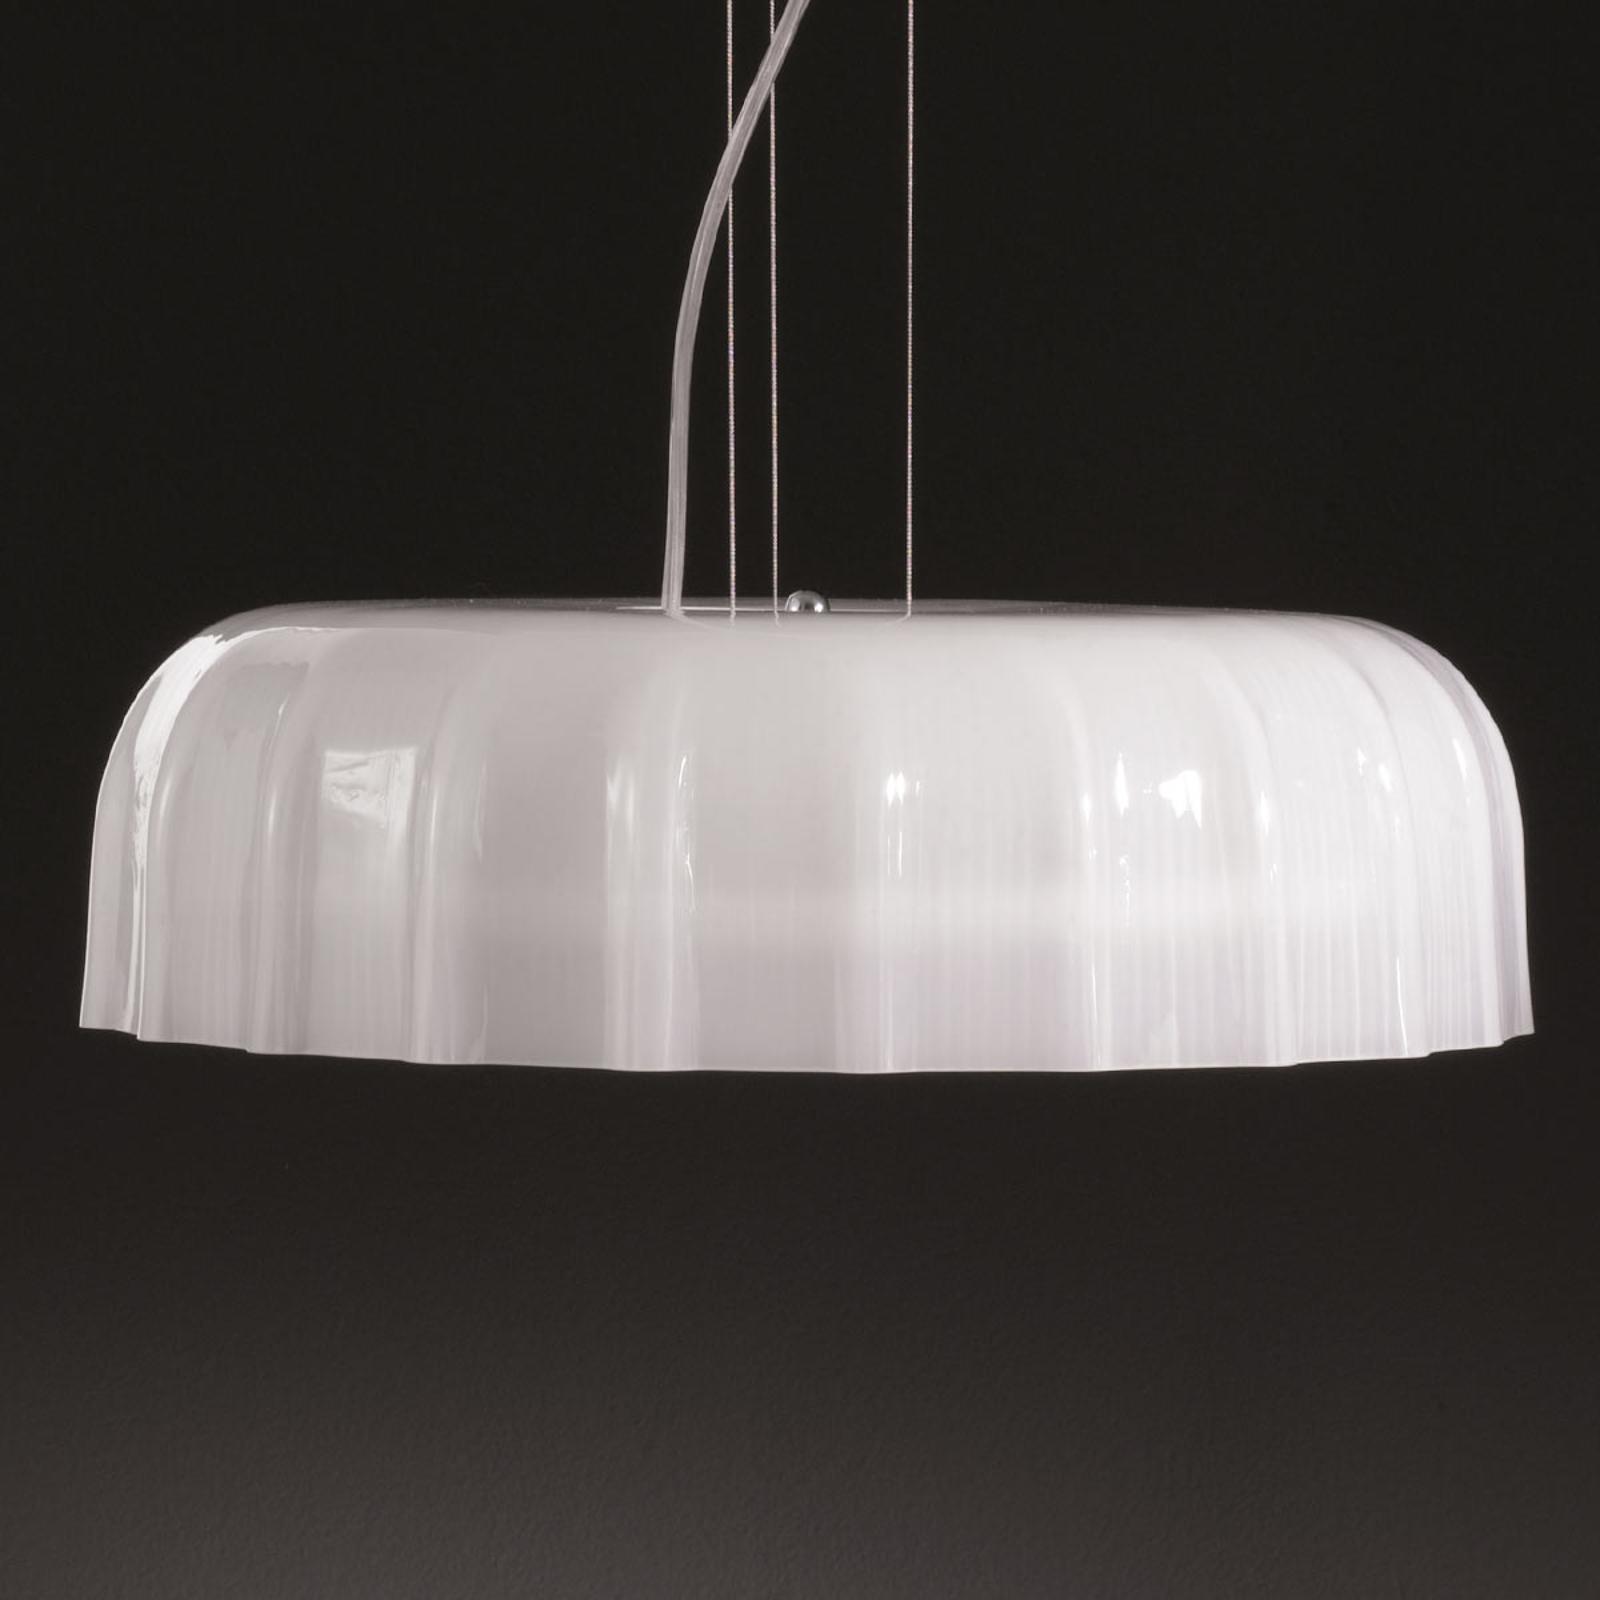 Nowoczesna lampa wisząca Big Cap biała